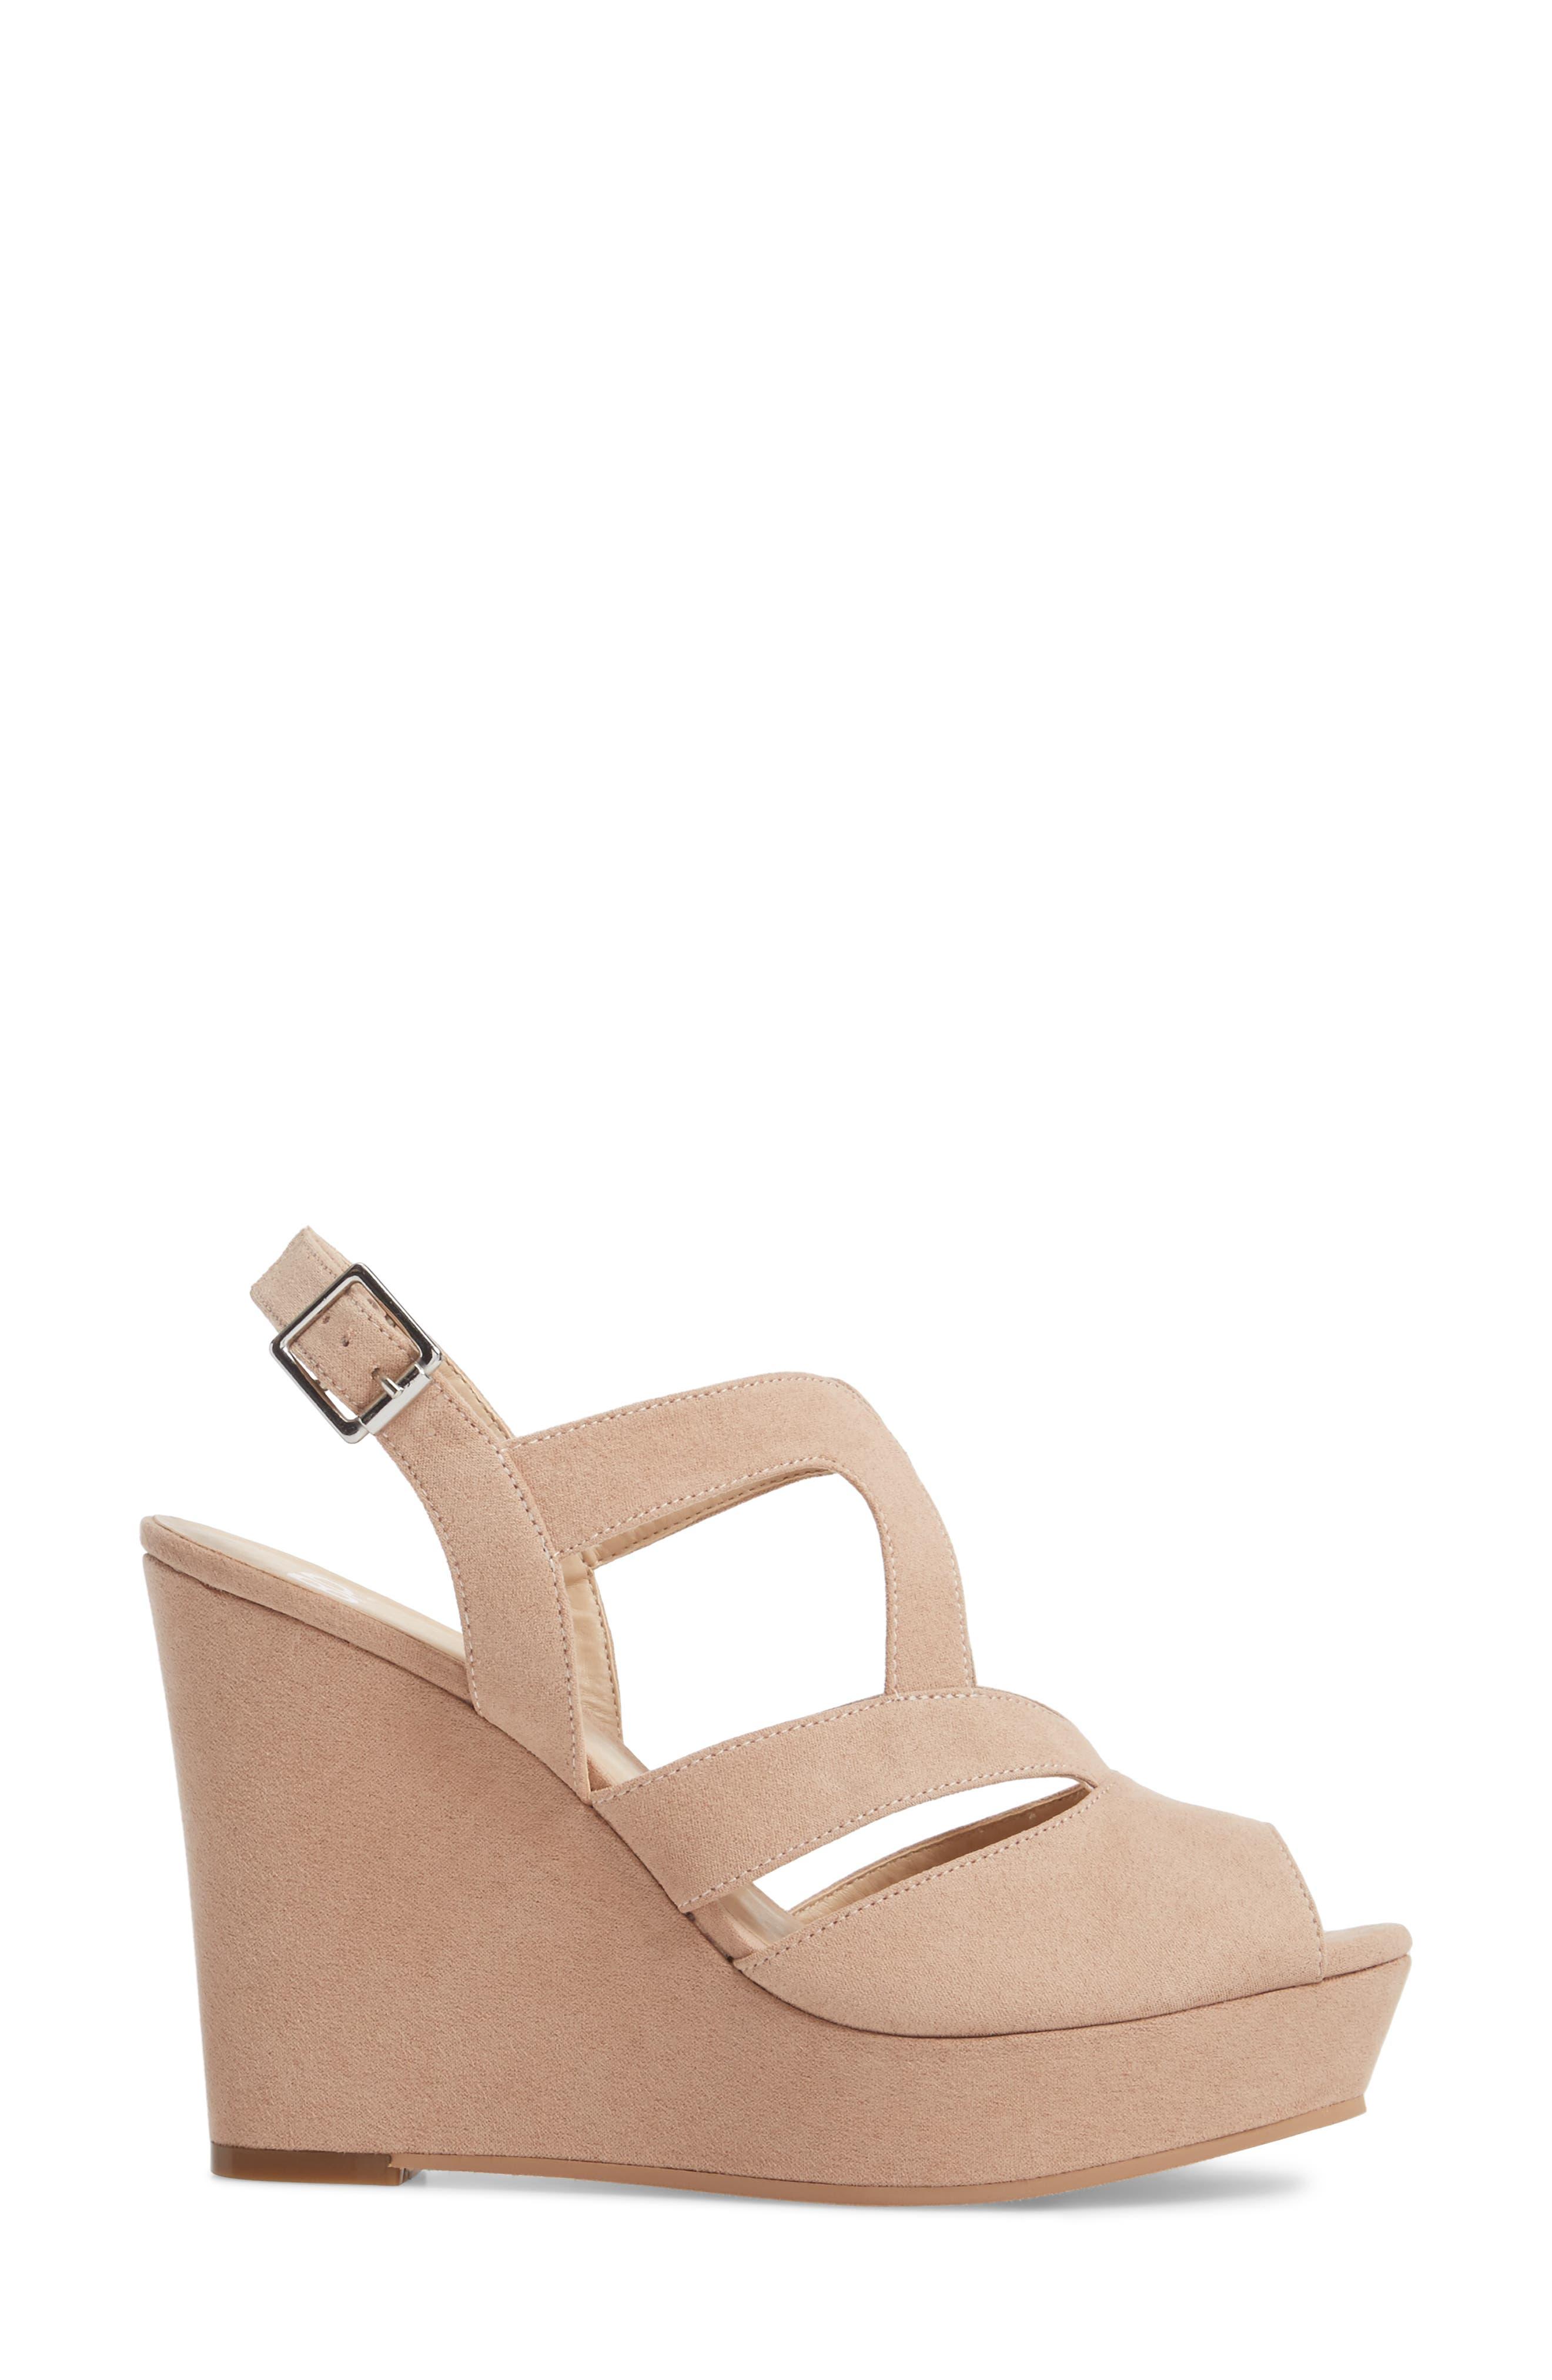 Sunny Platform Wedge Sandal,                             Alternate thumbnail 3, color,                             Nude Faux Suede